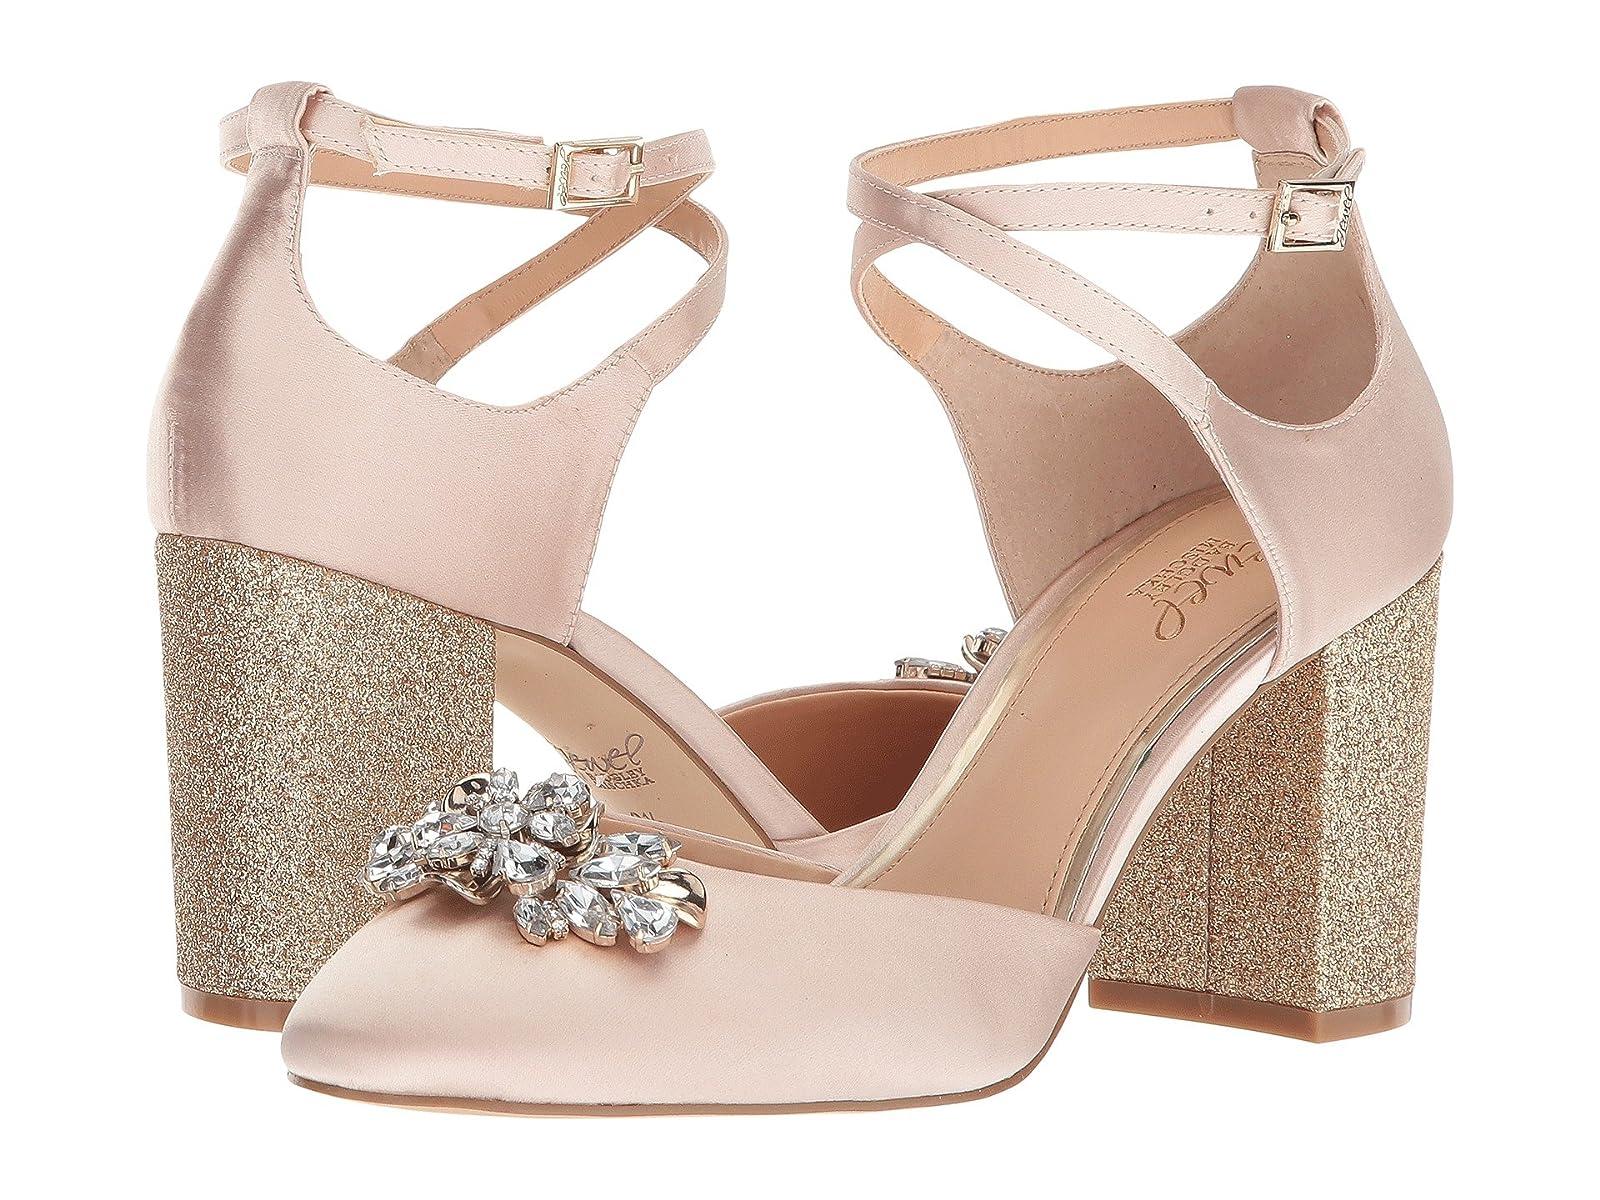 Jewel Badgley Mischka AiyanaCheap and distinctive eye-catching shoes